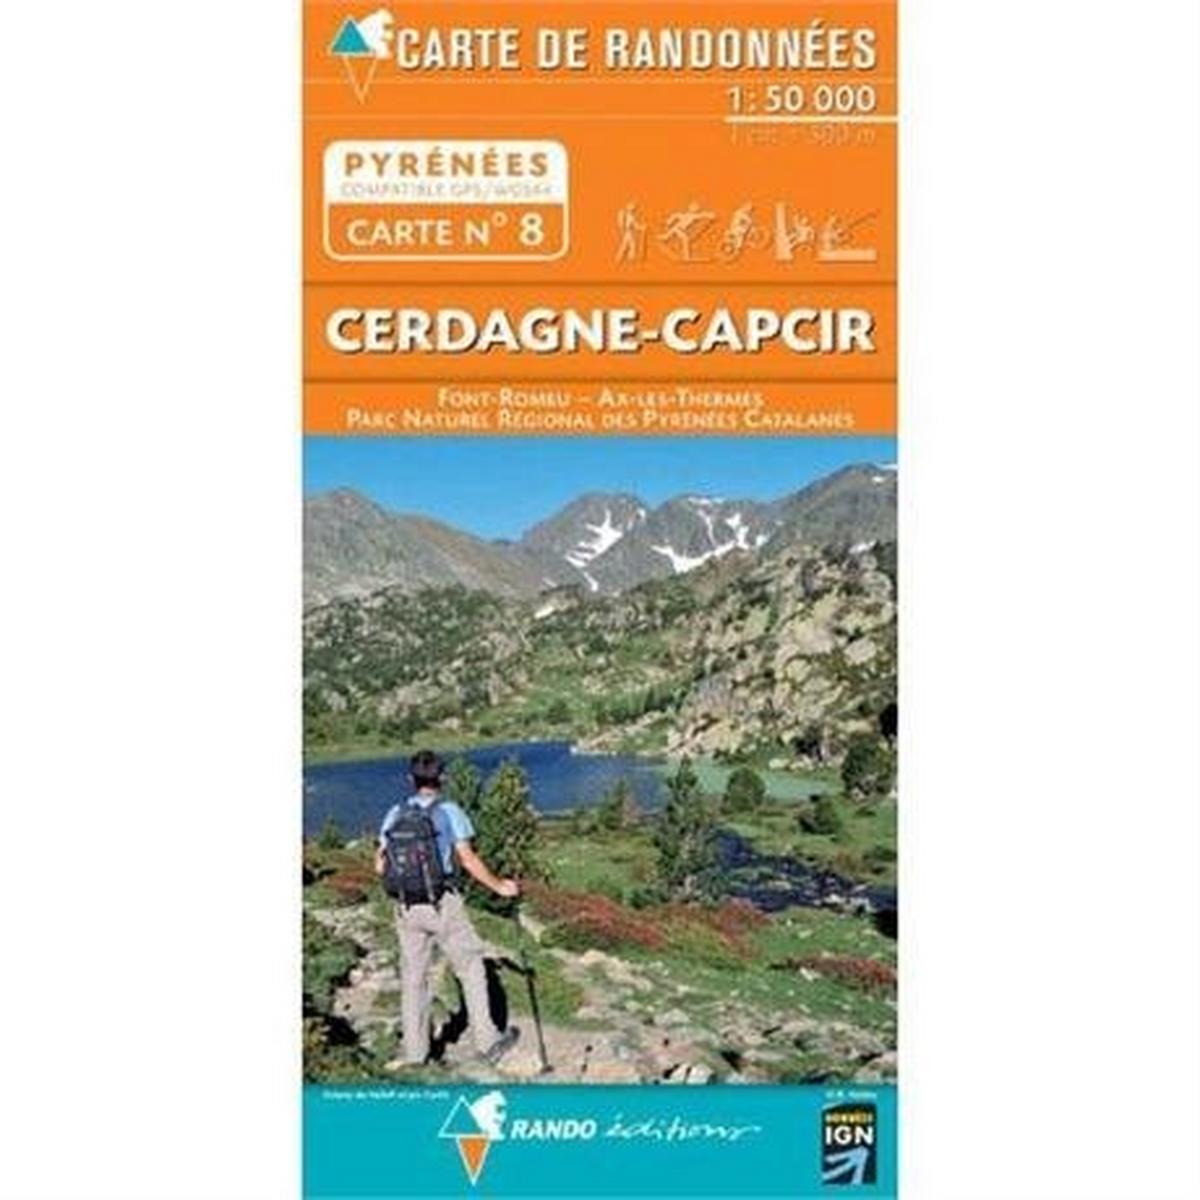 Ign Maps France IGN Map Rando Editions Cerdagne-Capcir